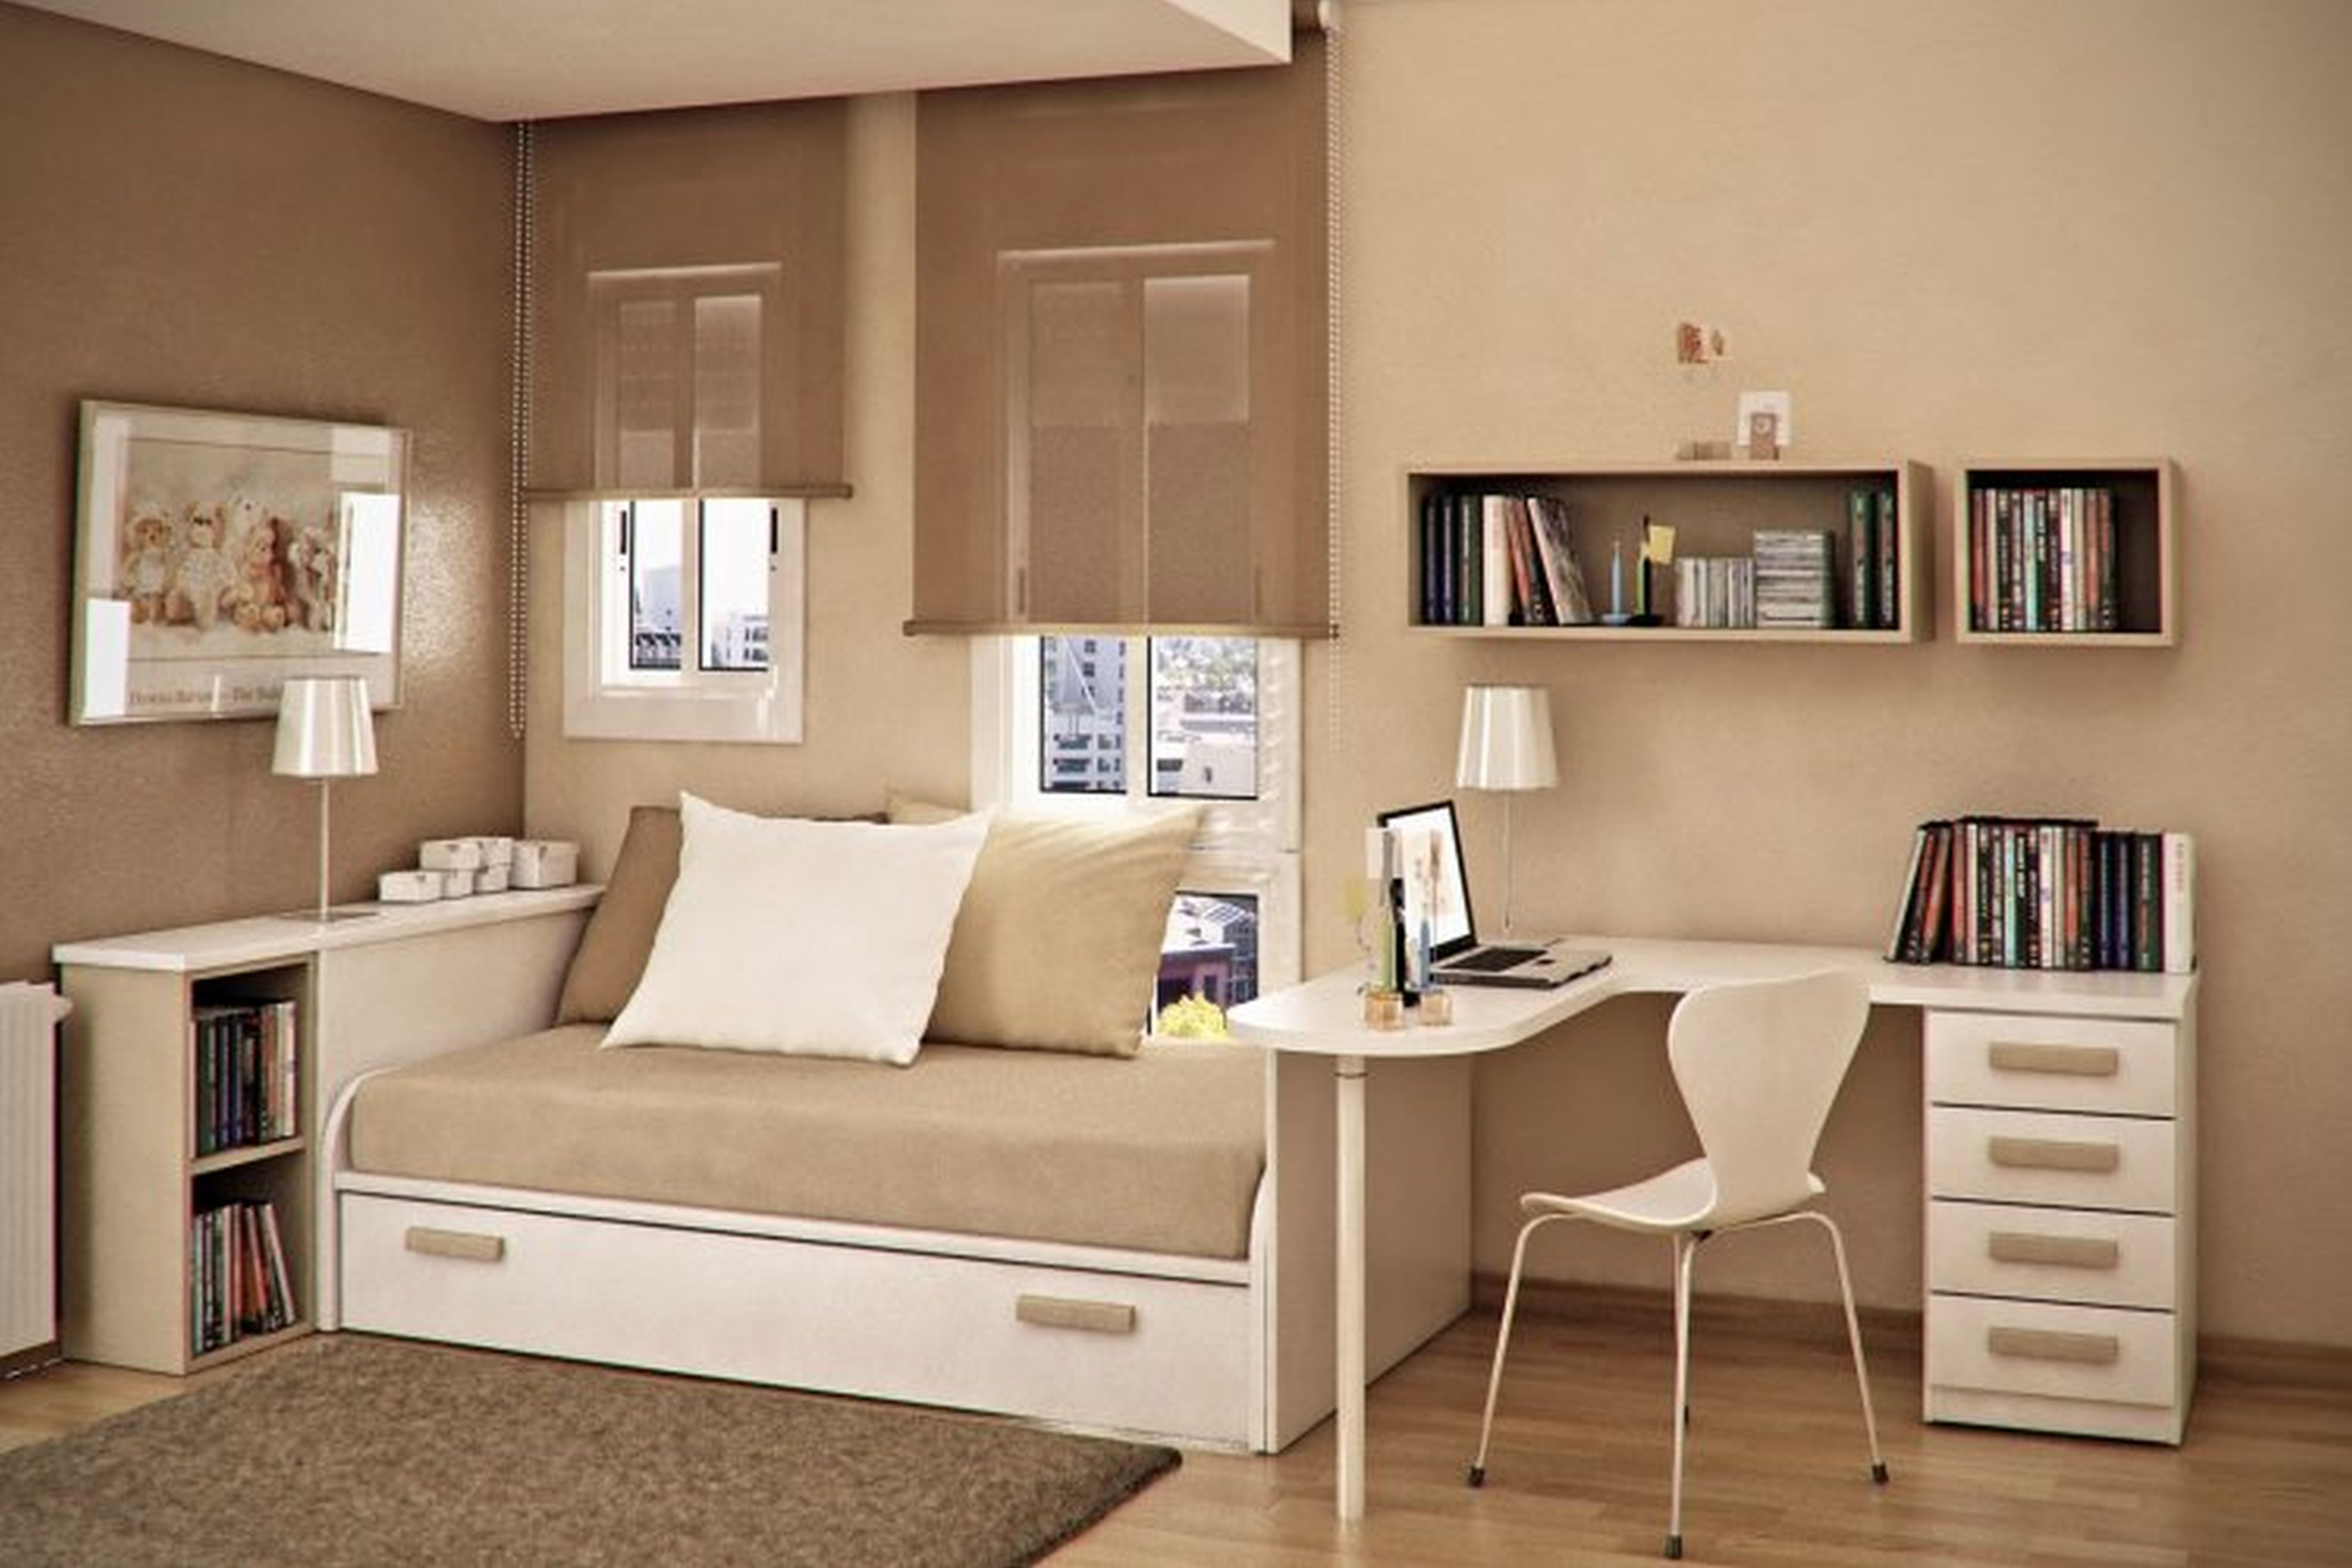 Bedroom Guest Ideas Modern Ewer White Flowers Sofa Bed. Spare Bedroom Sofa Bed Ideas   Bedroom biji us